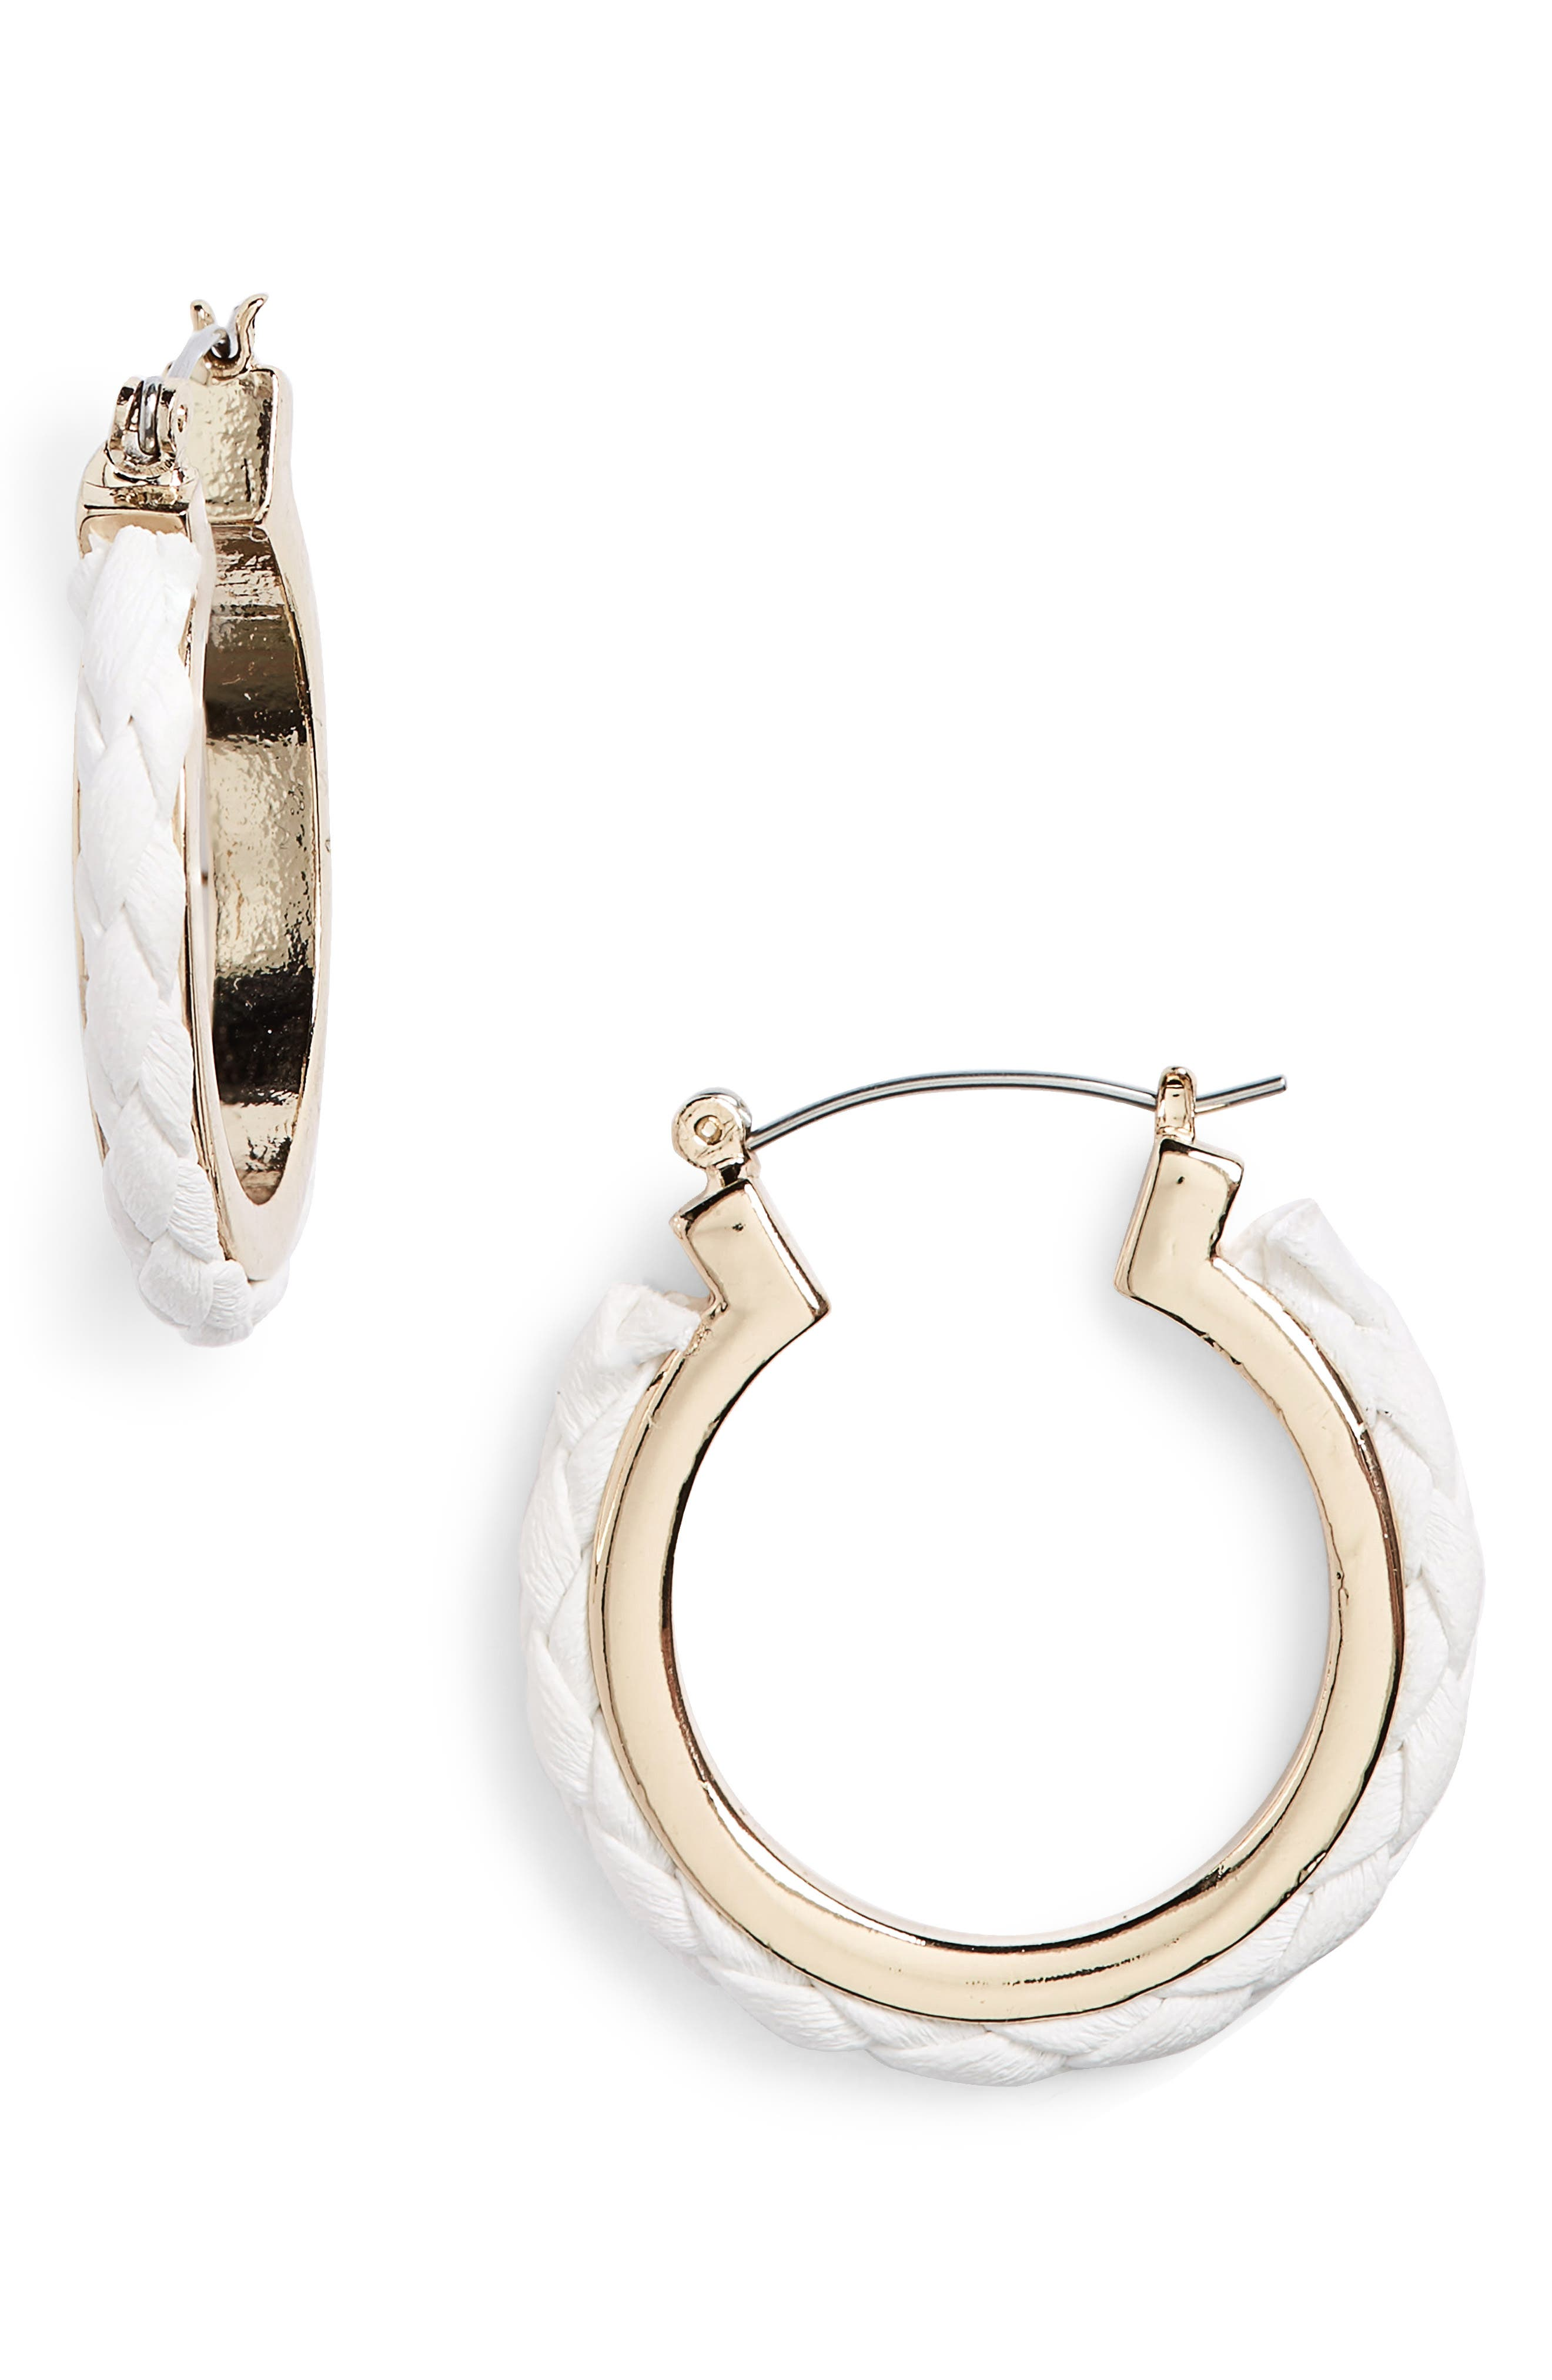 Fabric Plait Hoop Earrings,                             Main thumbnail 1, color,                             White